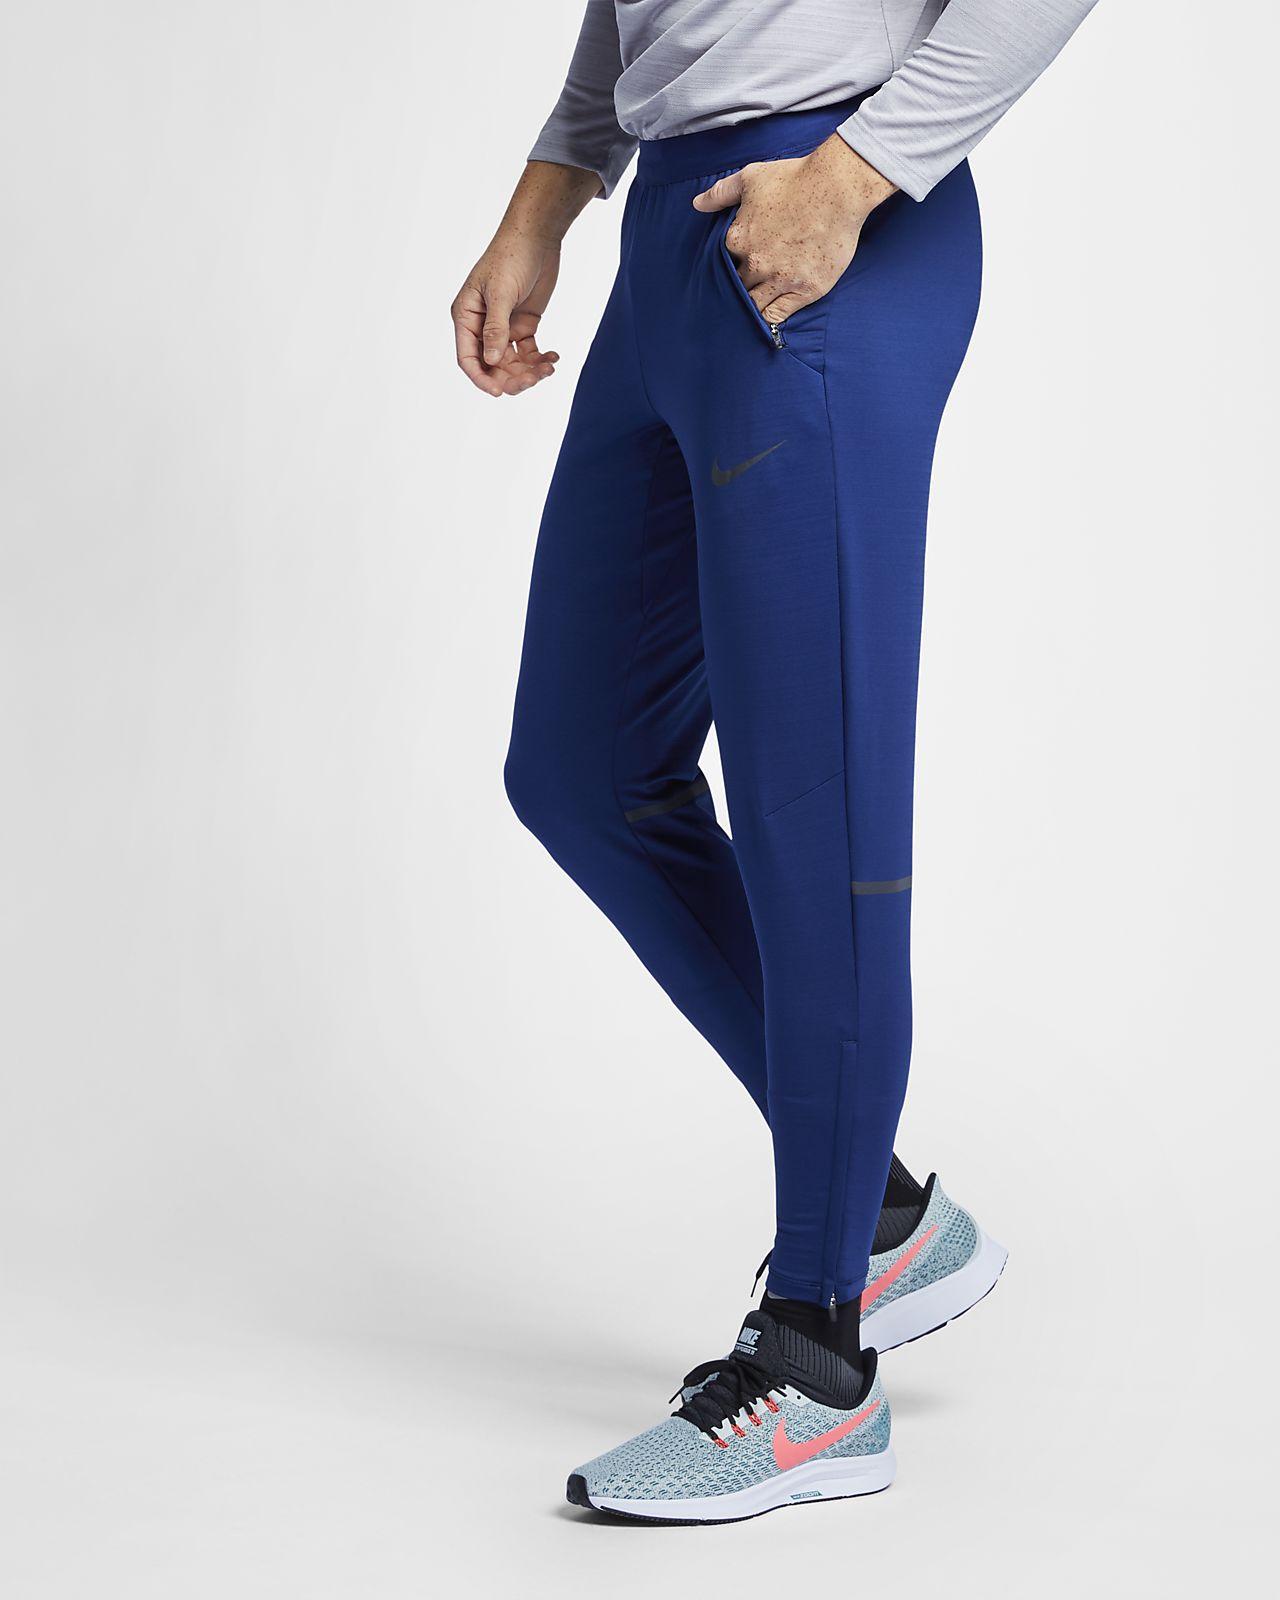 0218a49231e1 Nike Phenom Men s Running Trousers. Nike.com IE